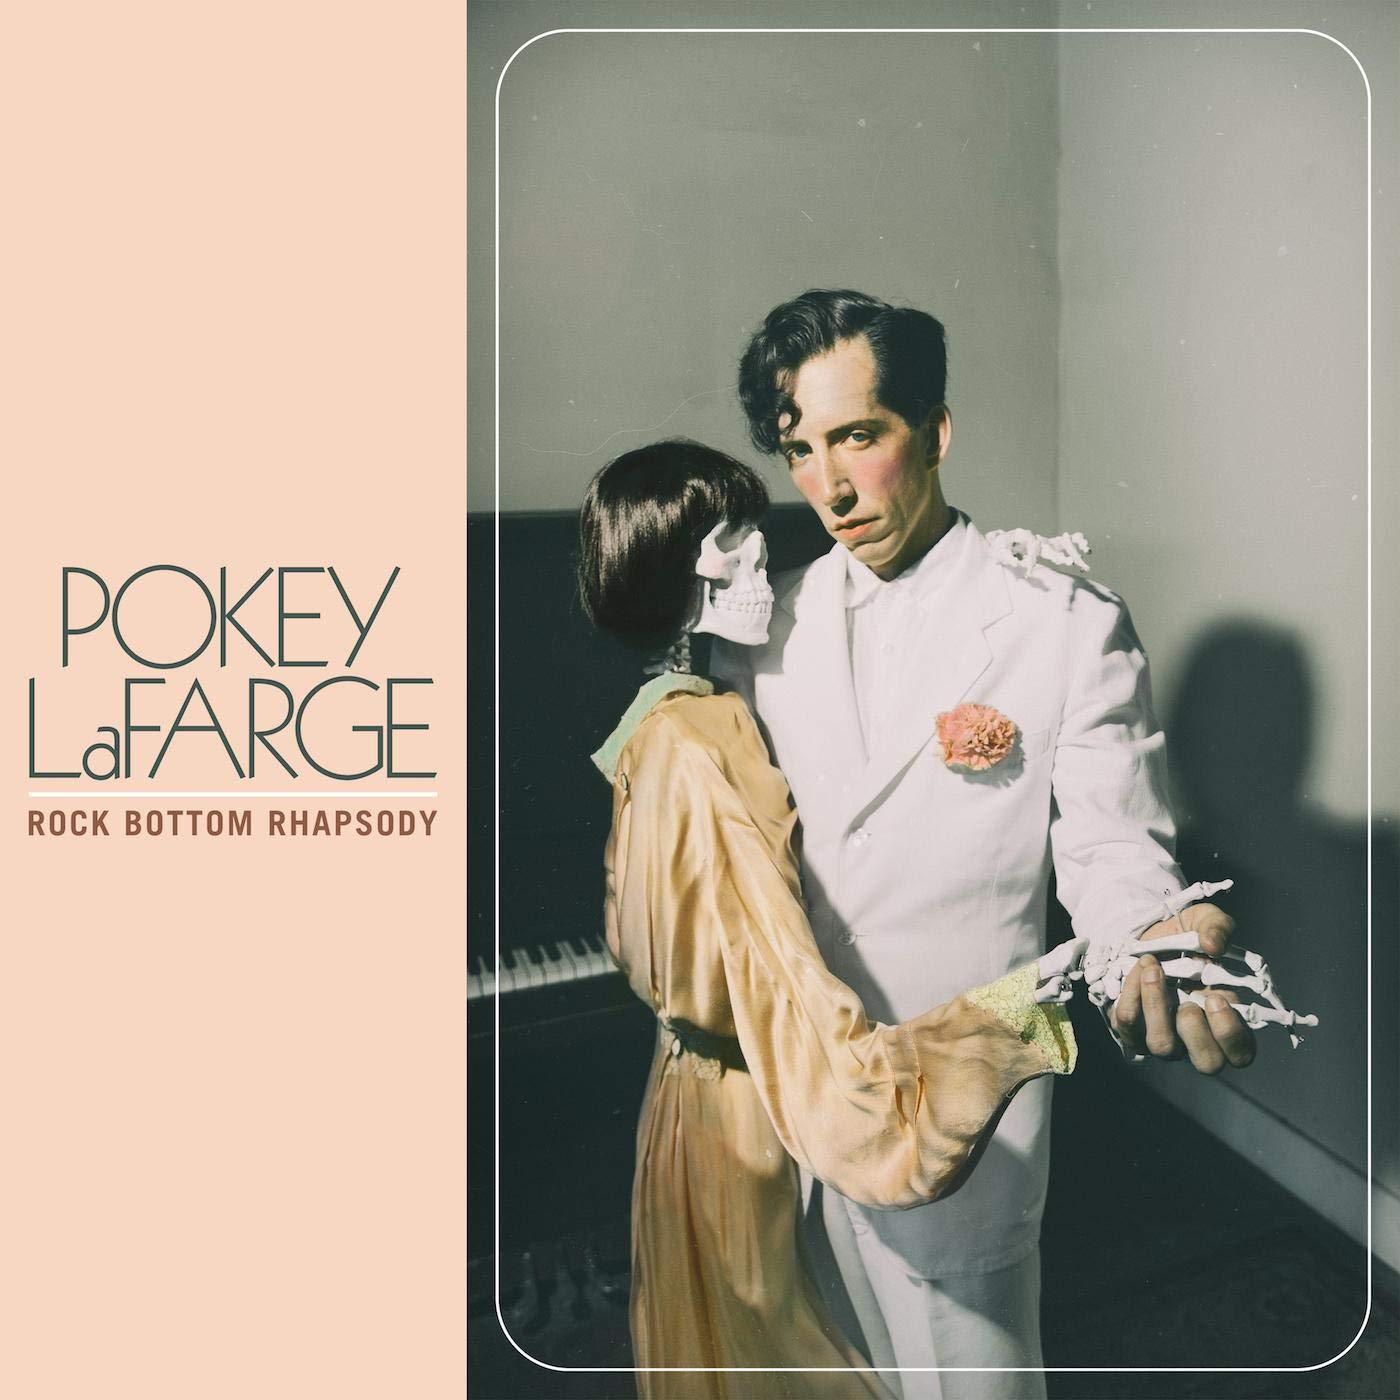 Pokey LaFarge - Rock Bottom Rhapsody